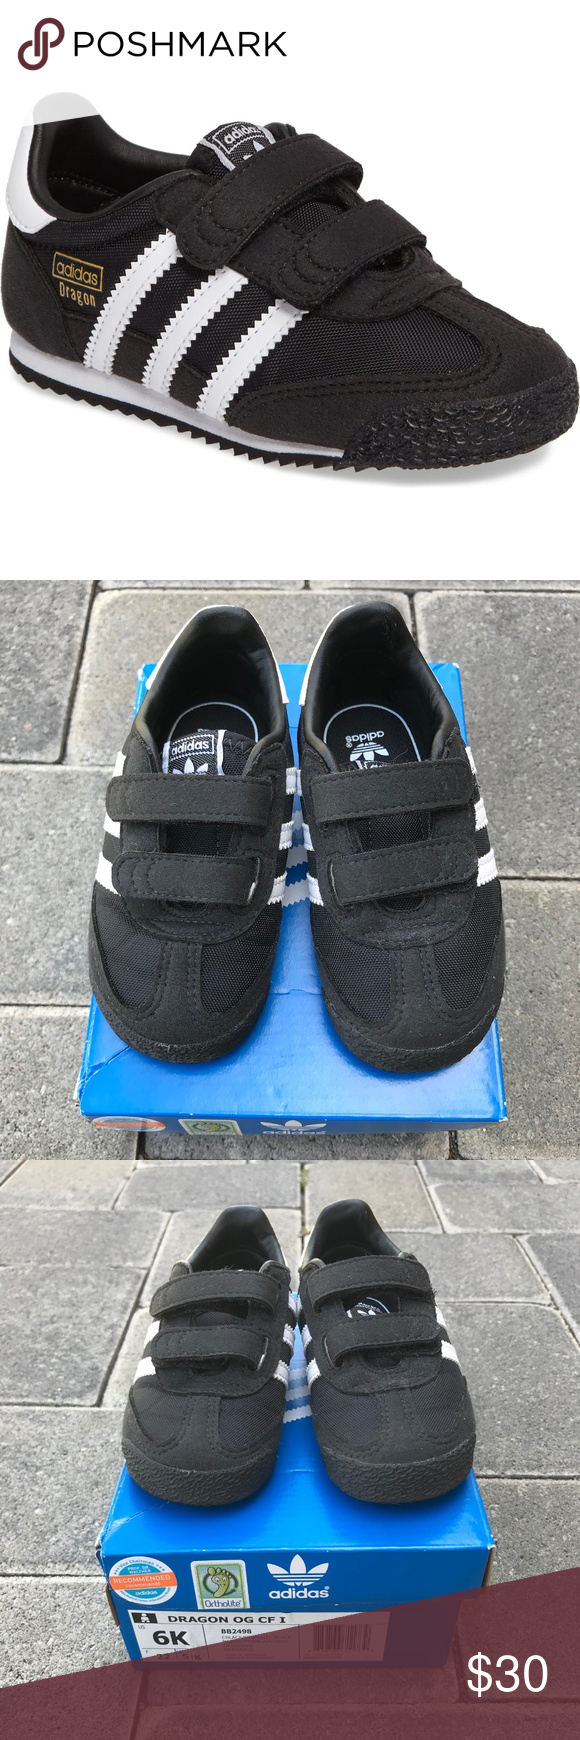 SOLD* adidas Dragon OG CF (Infant & Toddler) | Adidas dragon ...